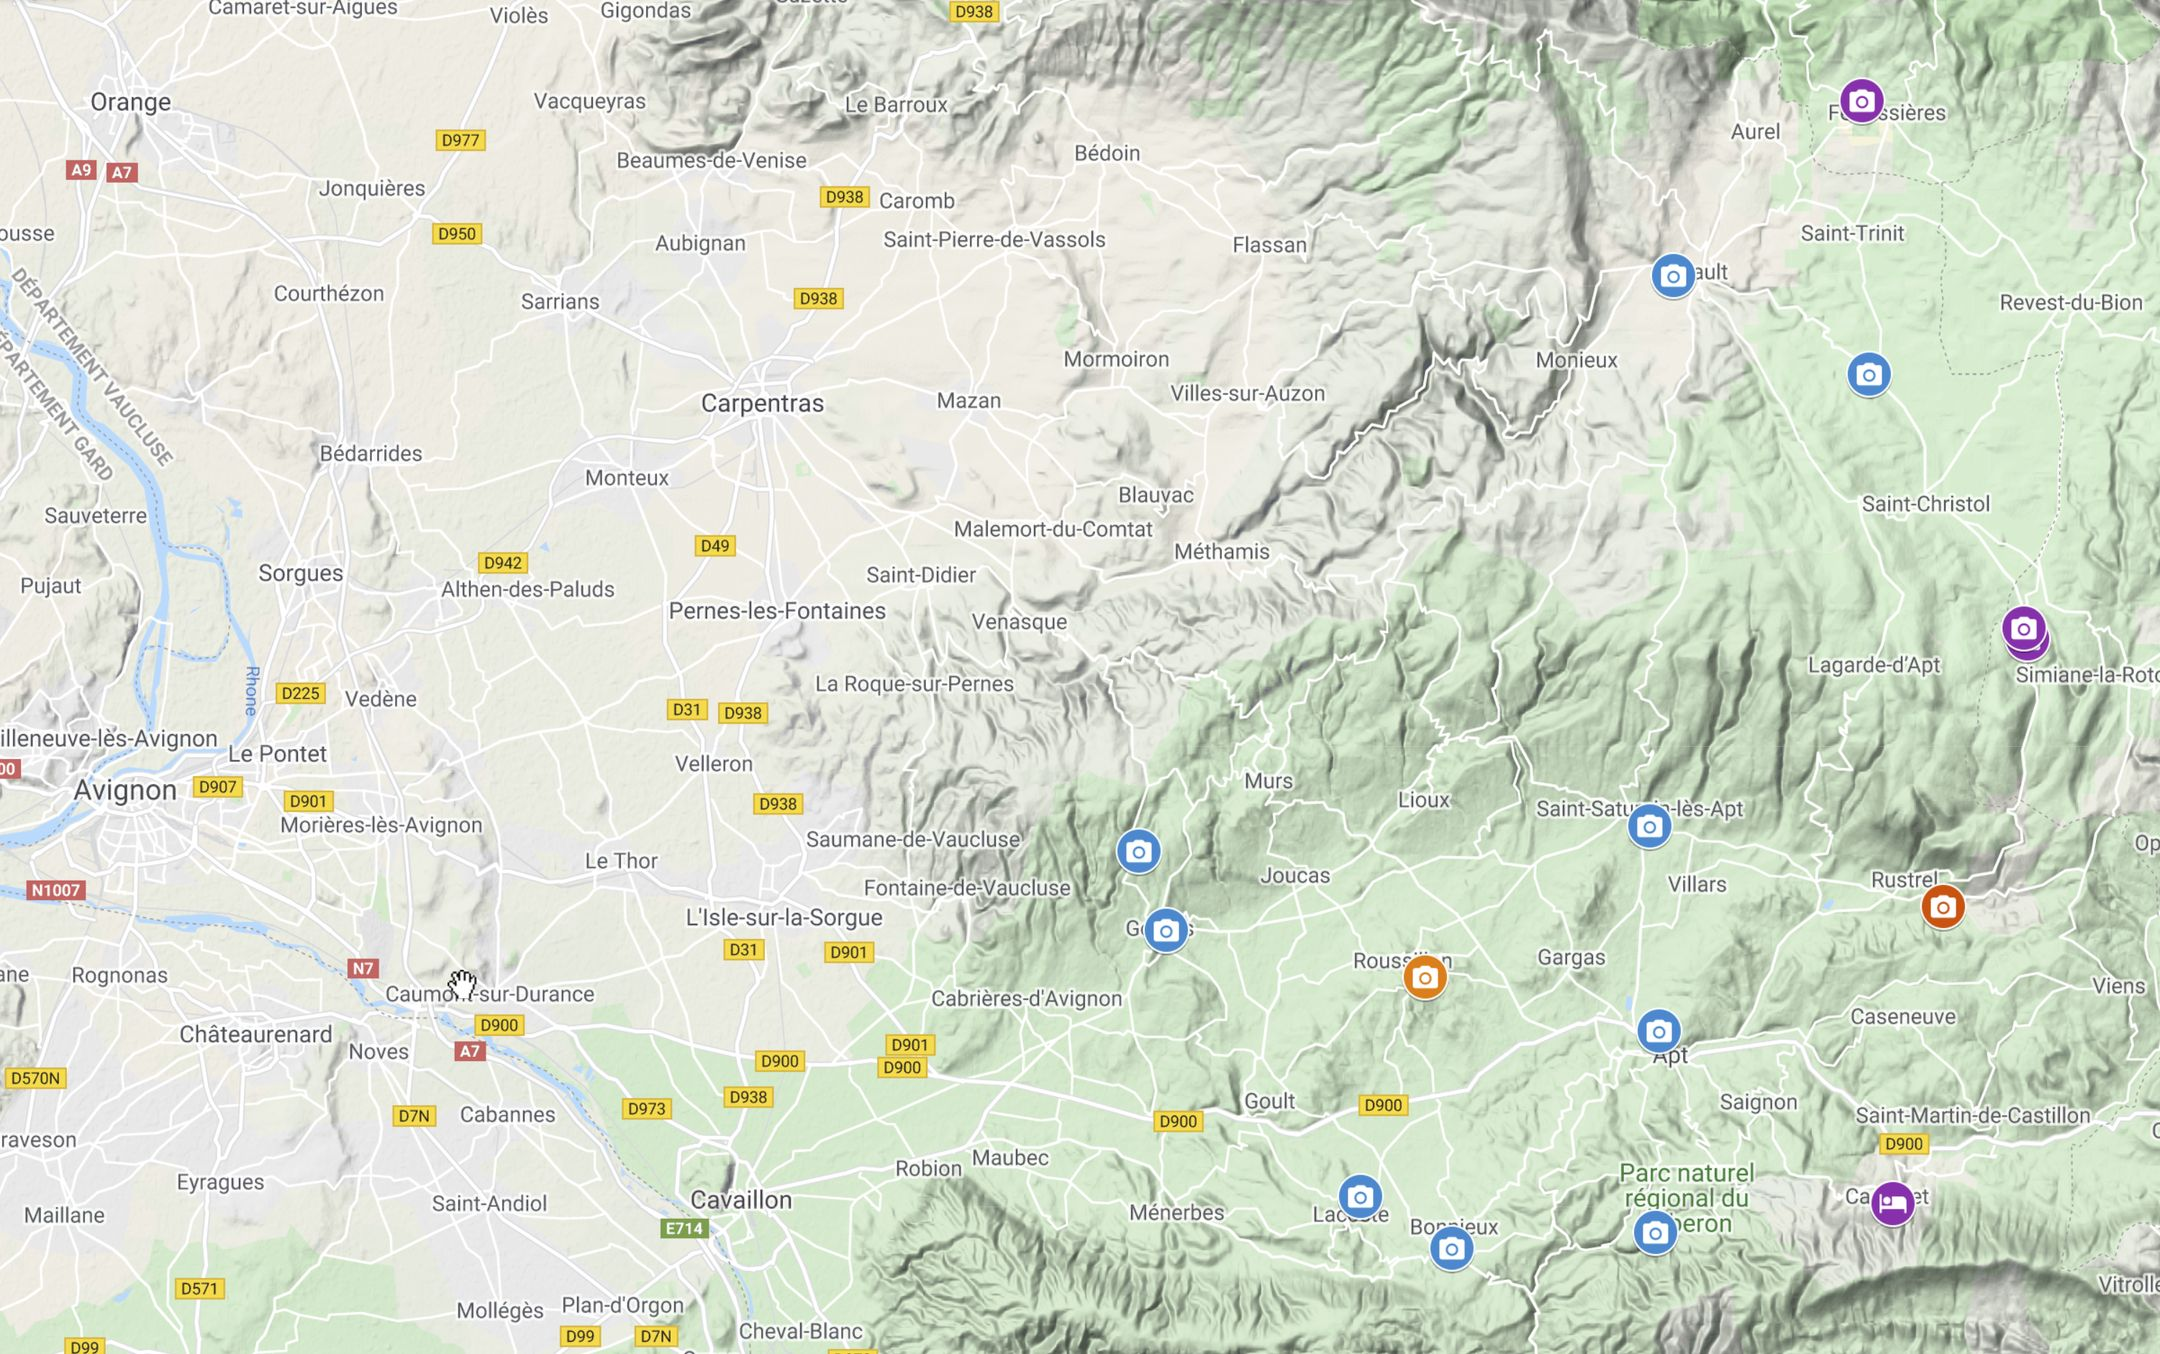 Karte_Frankreich_2021